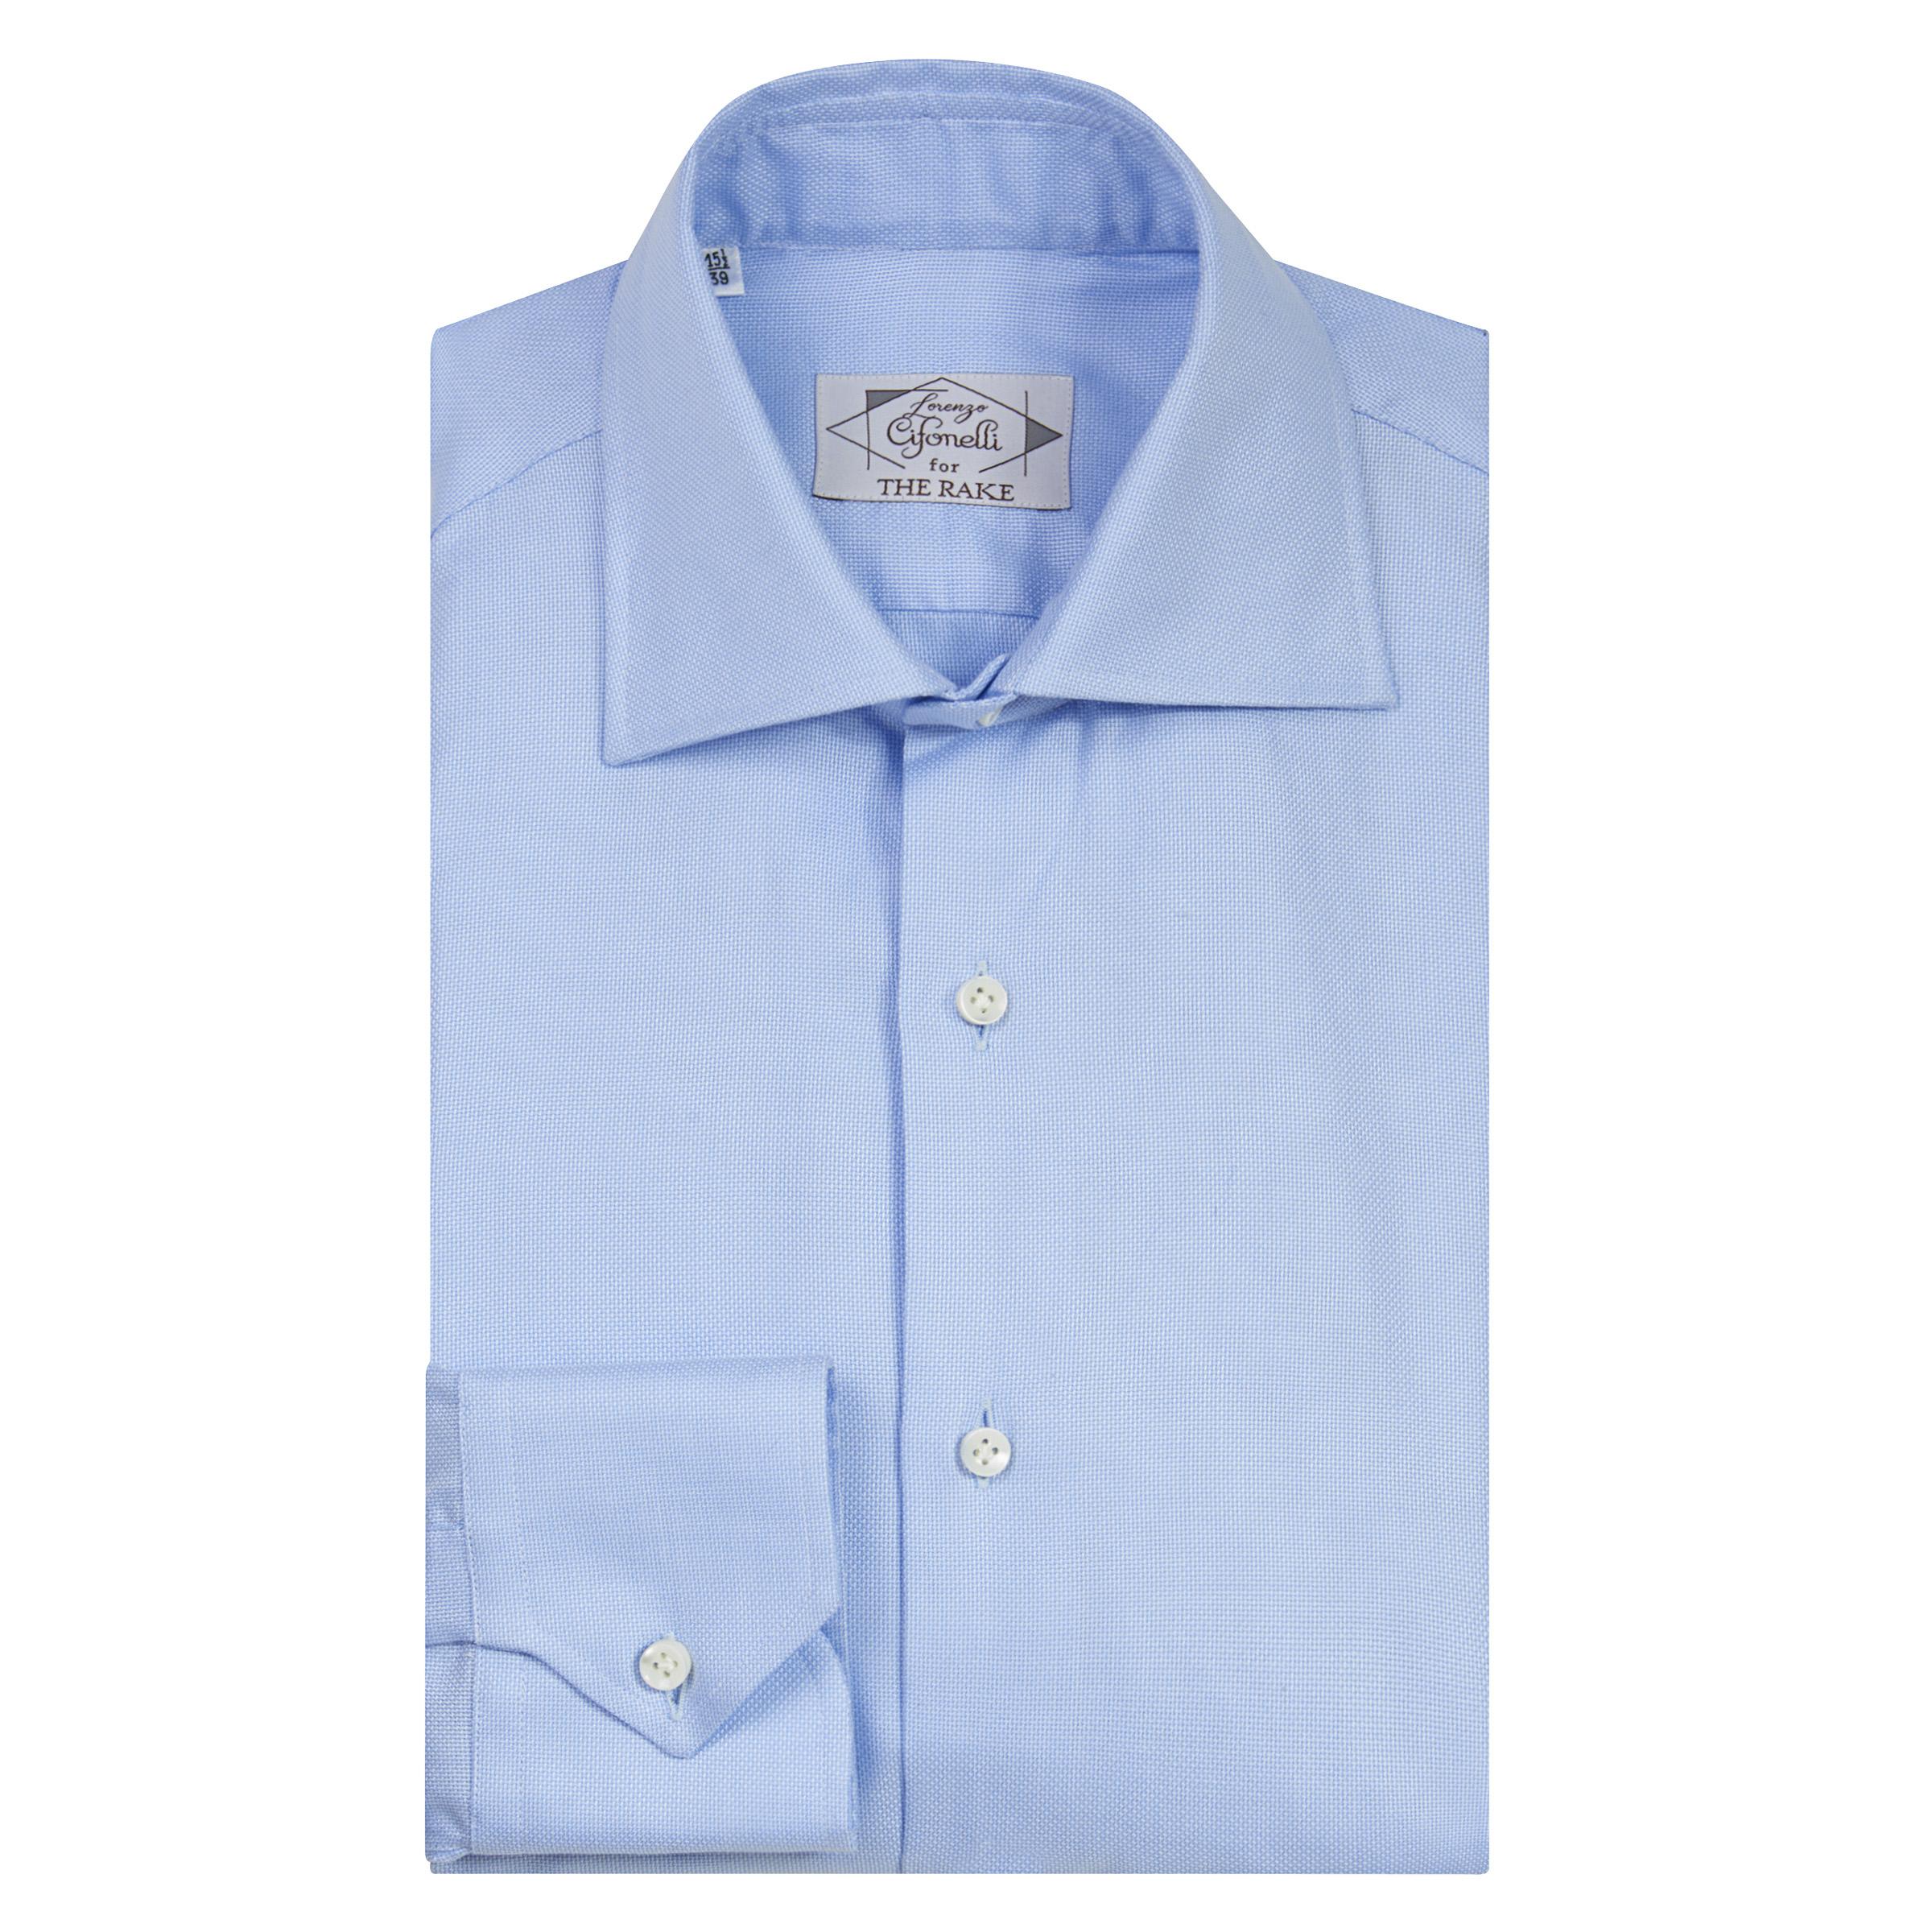 Powder Light Blue Cotton Classic Shirt